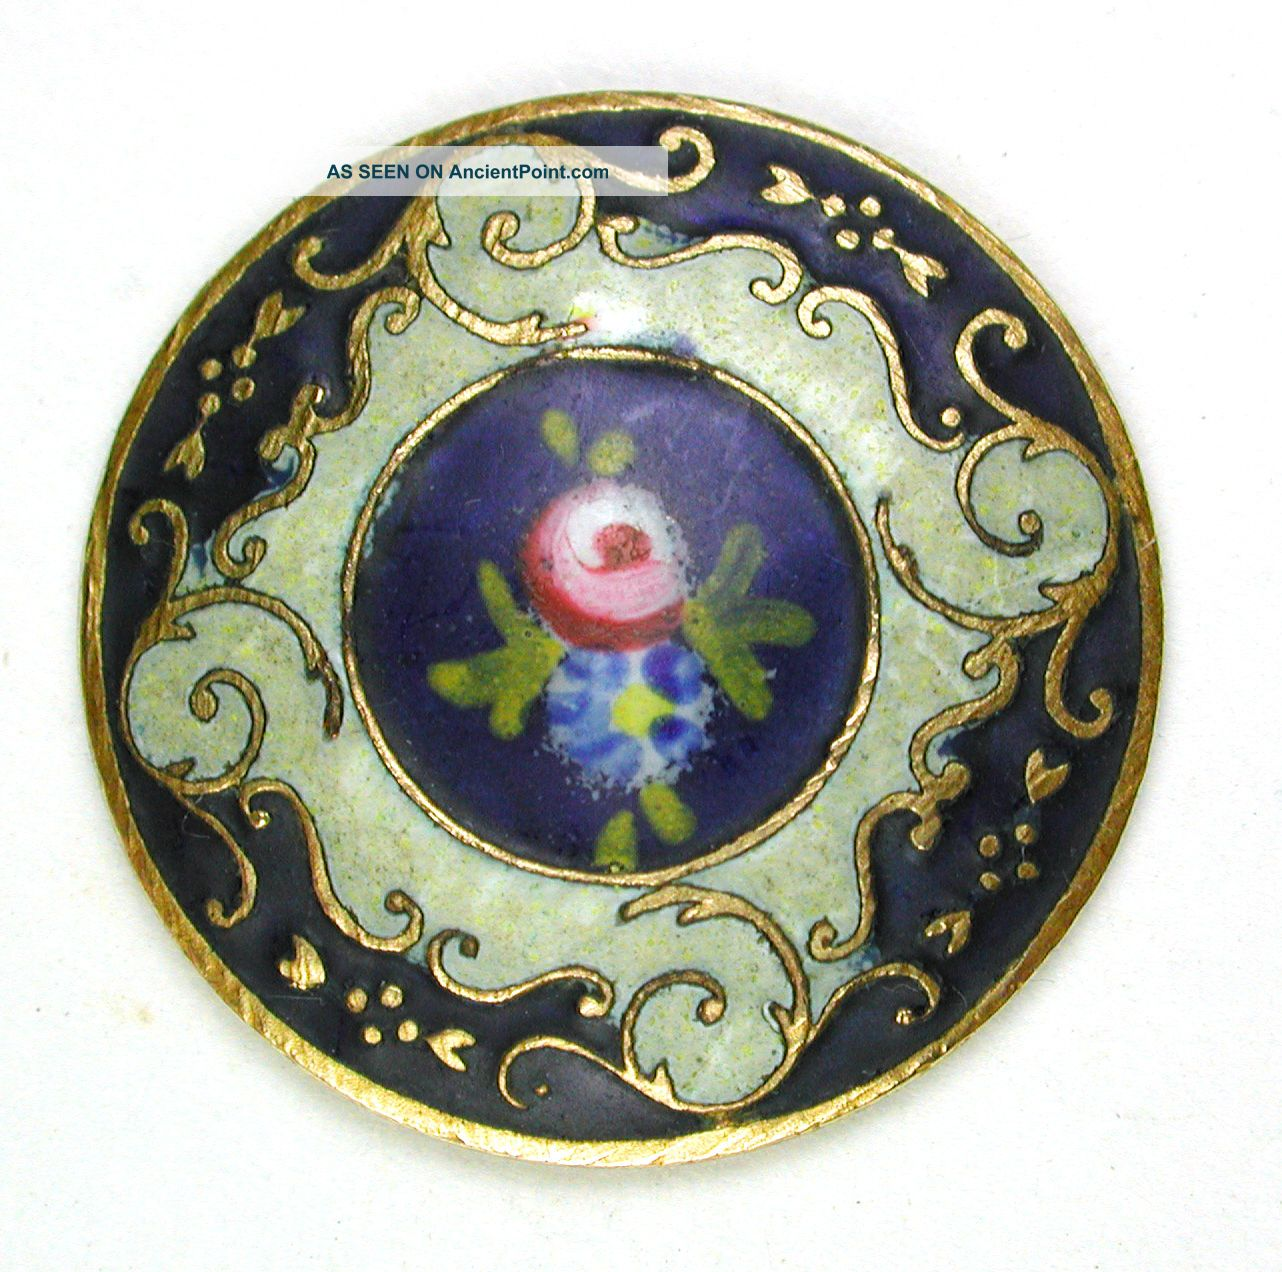 Antique French Enamel Button Hand Painted Rose W/ Cobalt & Cream Colors 7/8